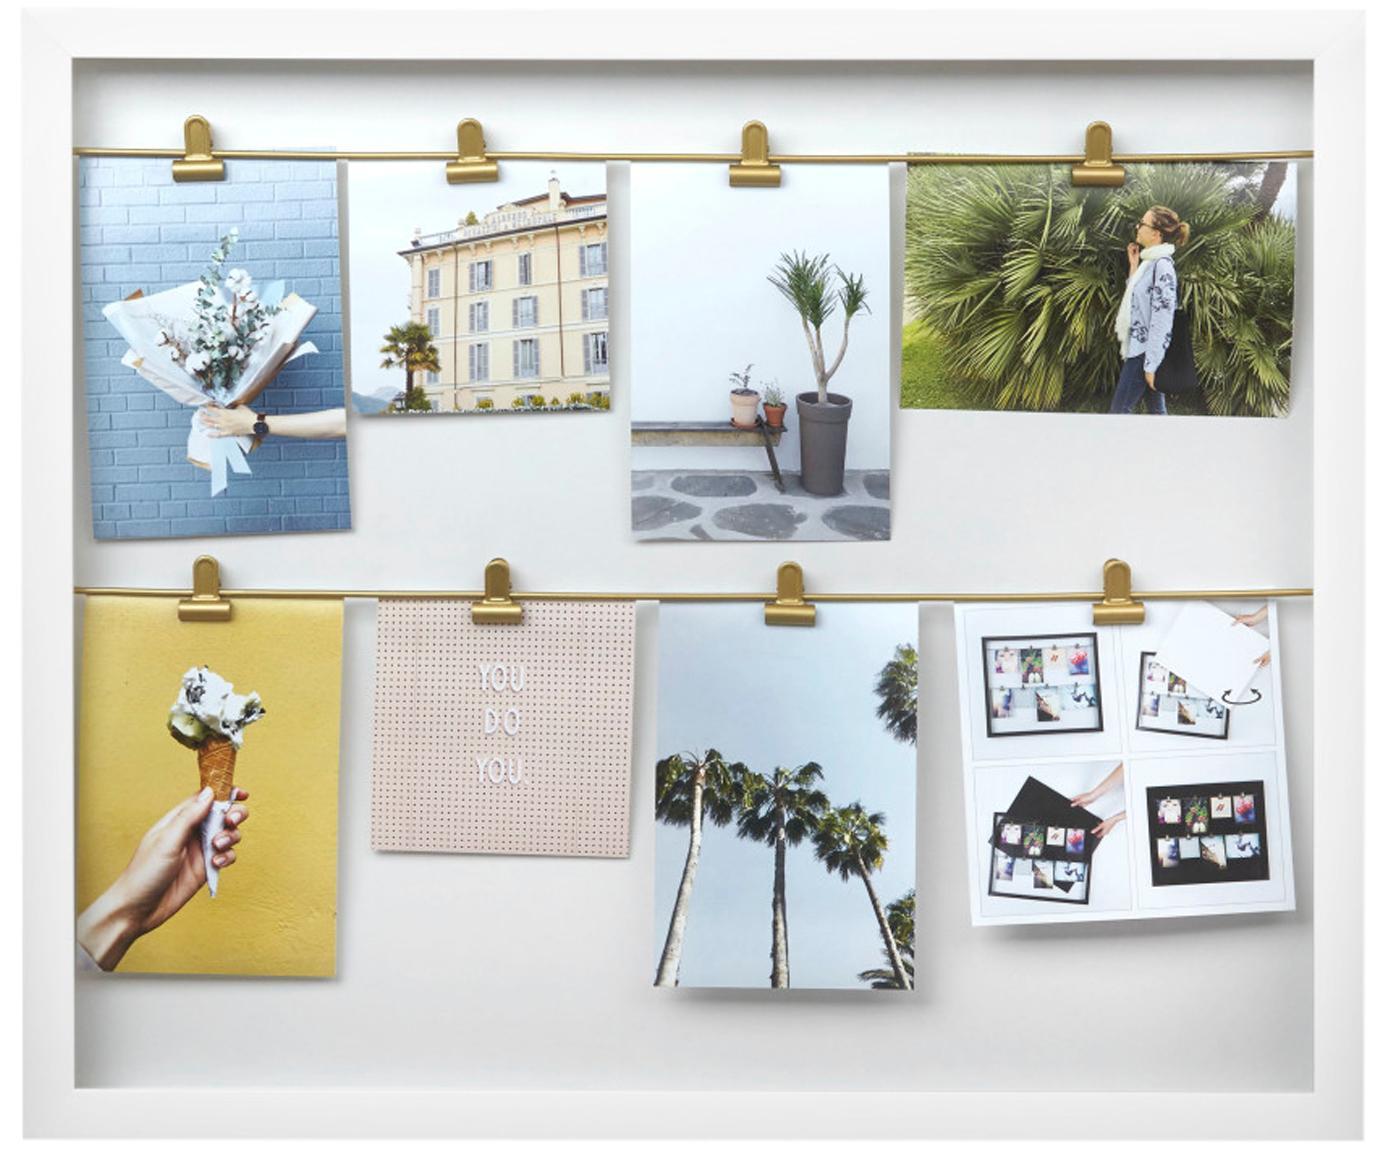 Fotolijstje Clipline, Gecoat hout, Wit, Verschillende formaten